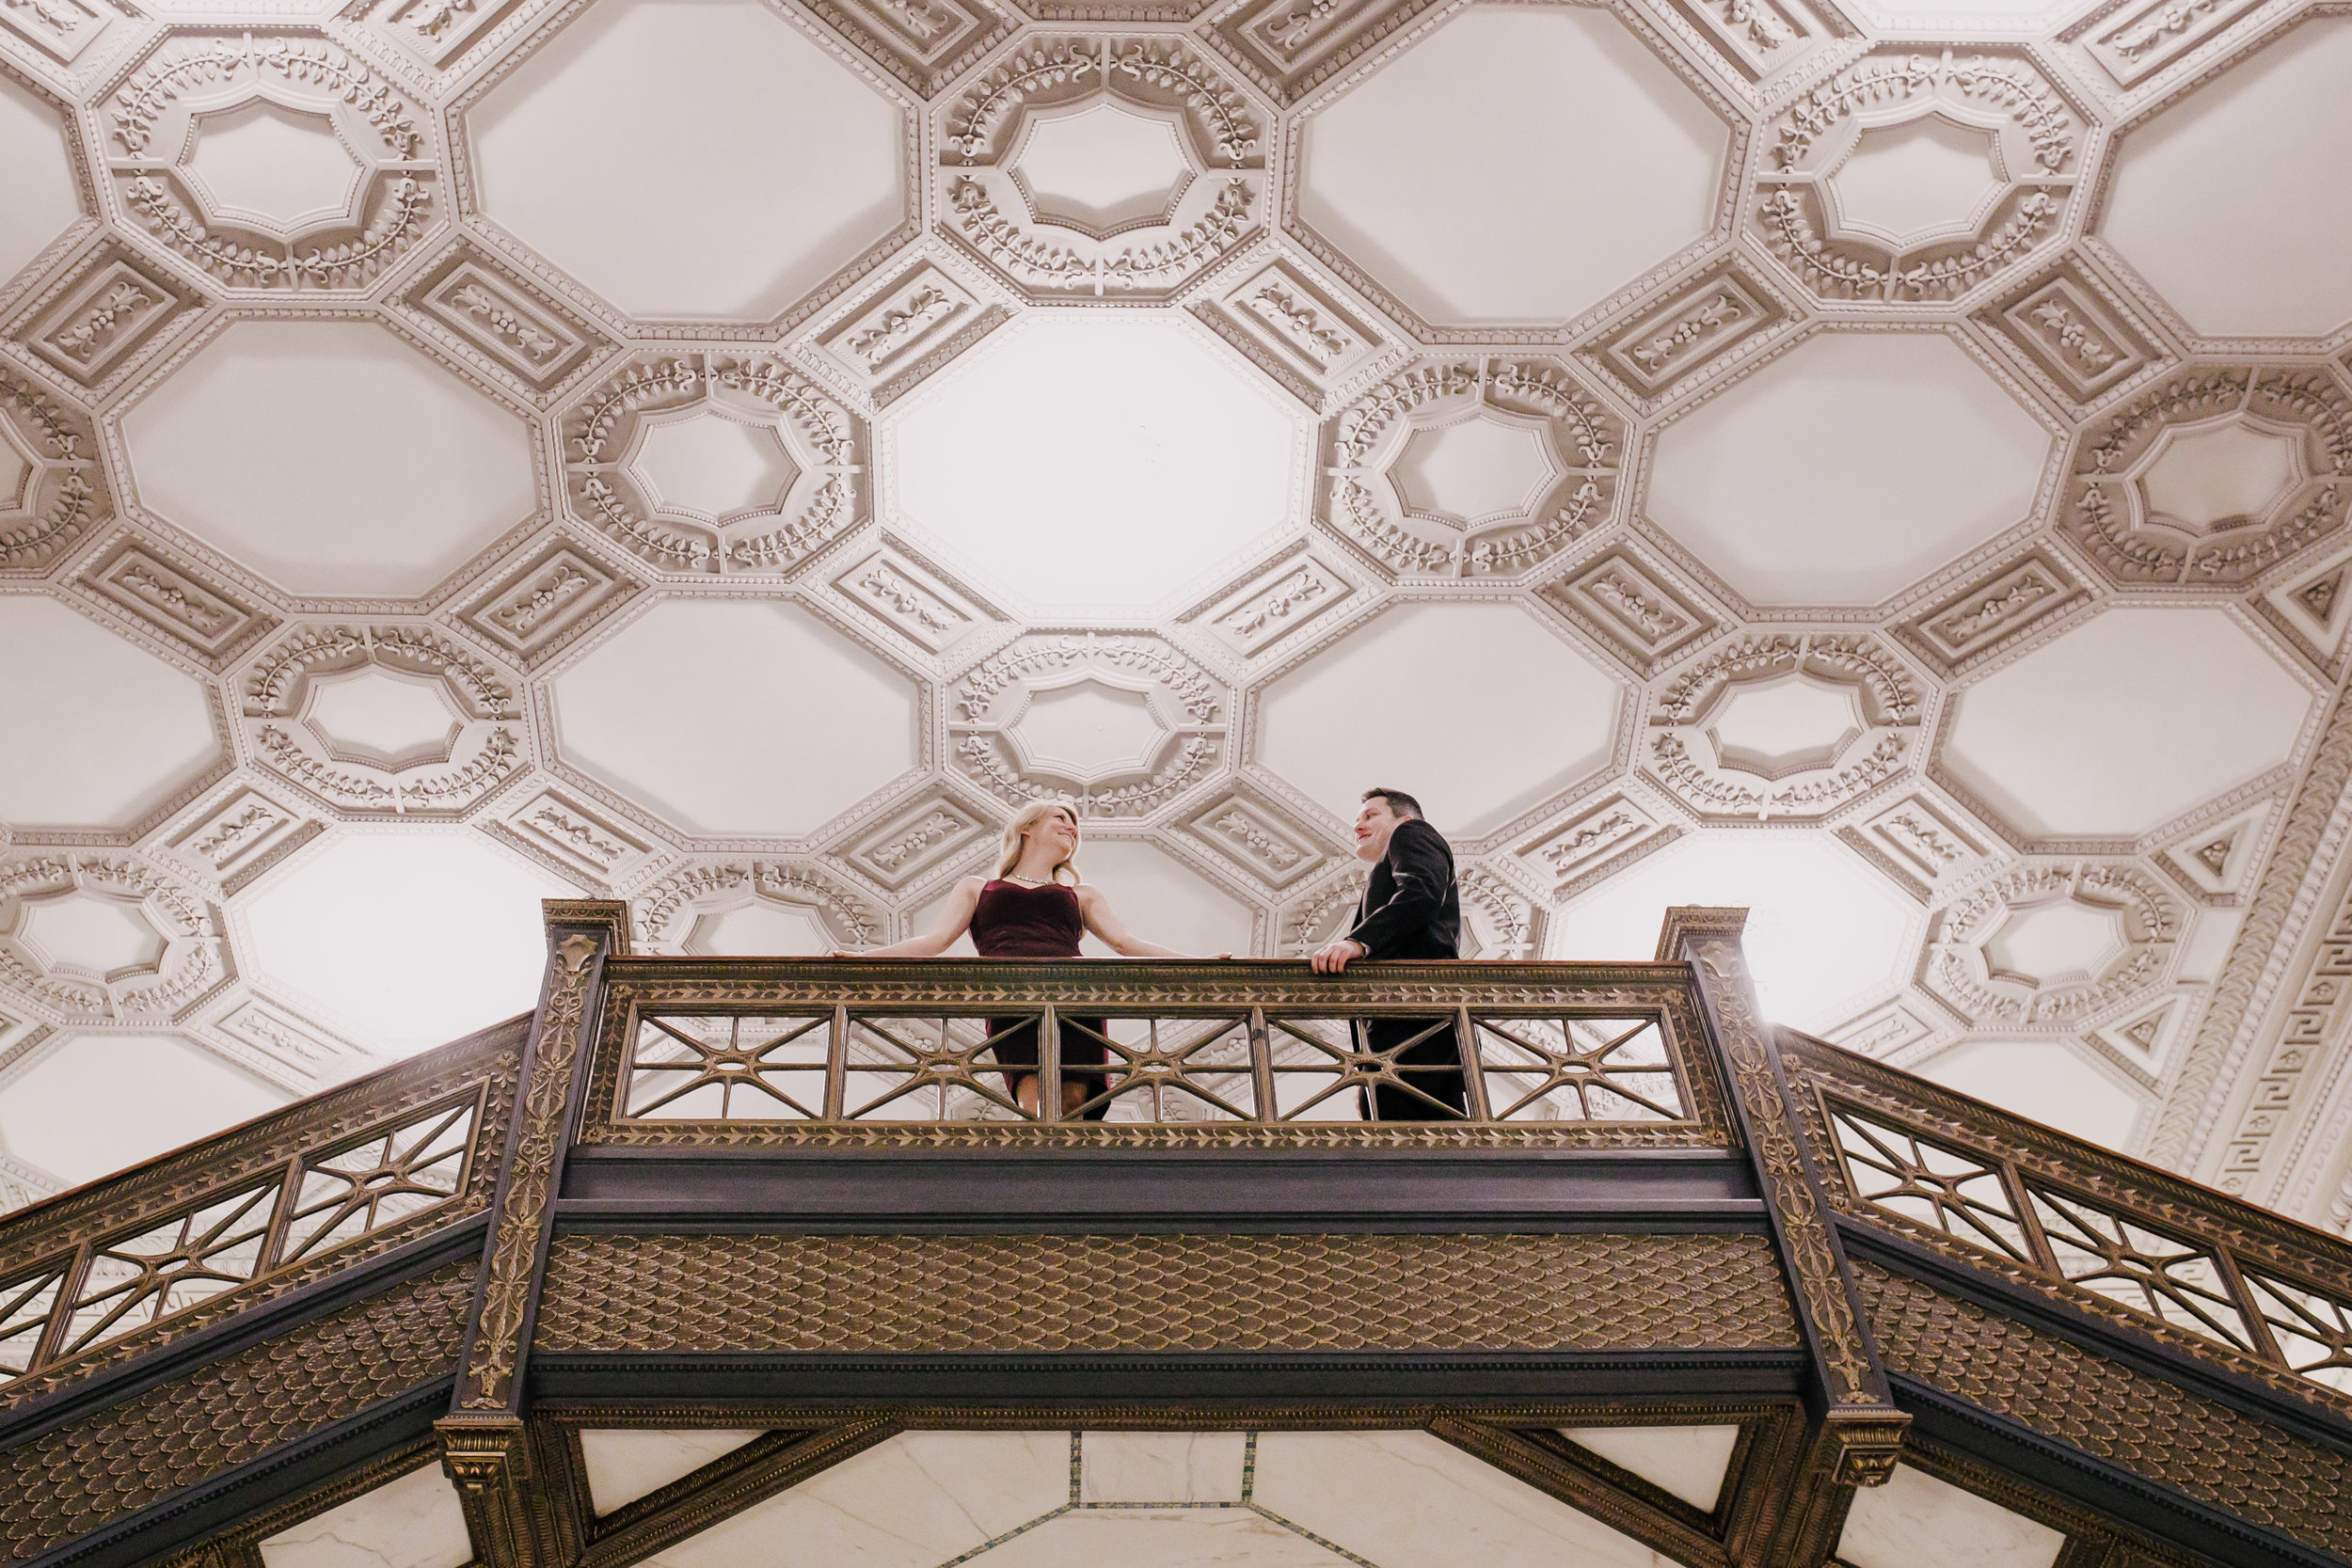 B&H Engagement shoot (Chicago)-49.jpg